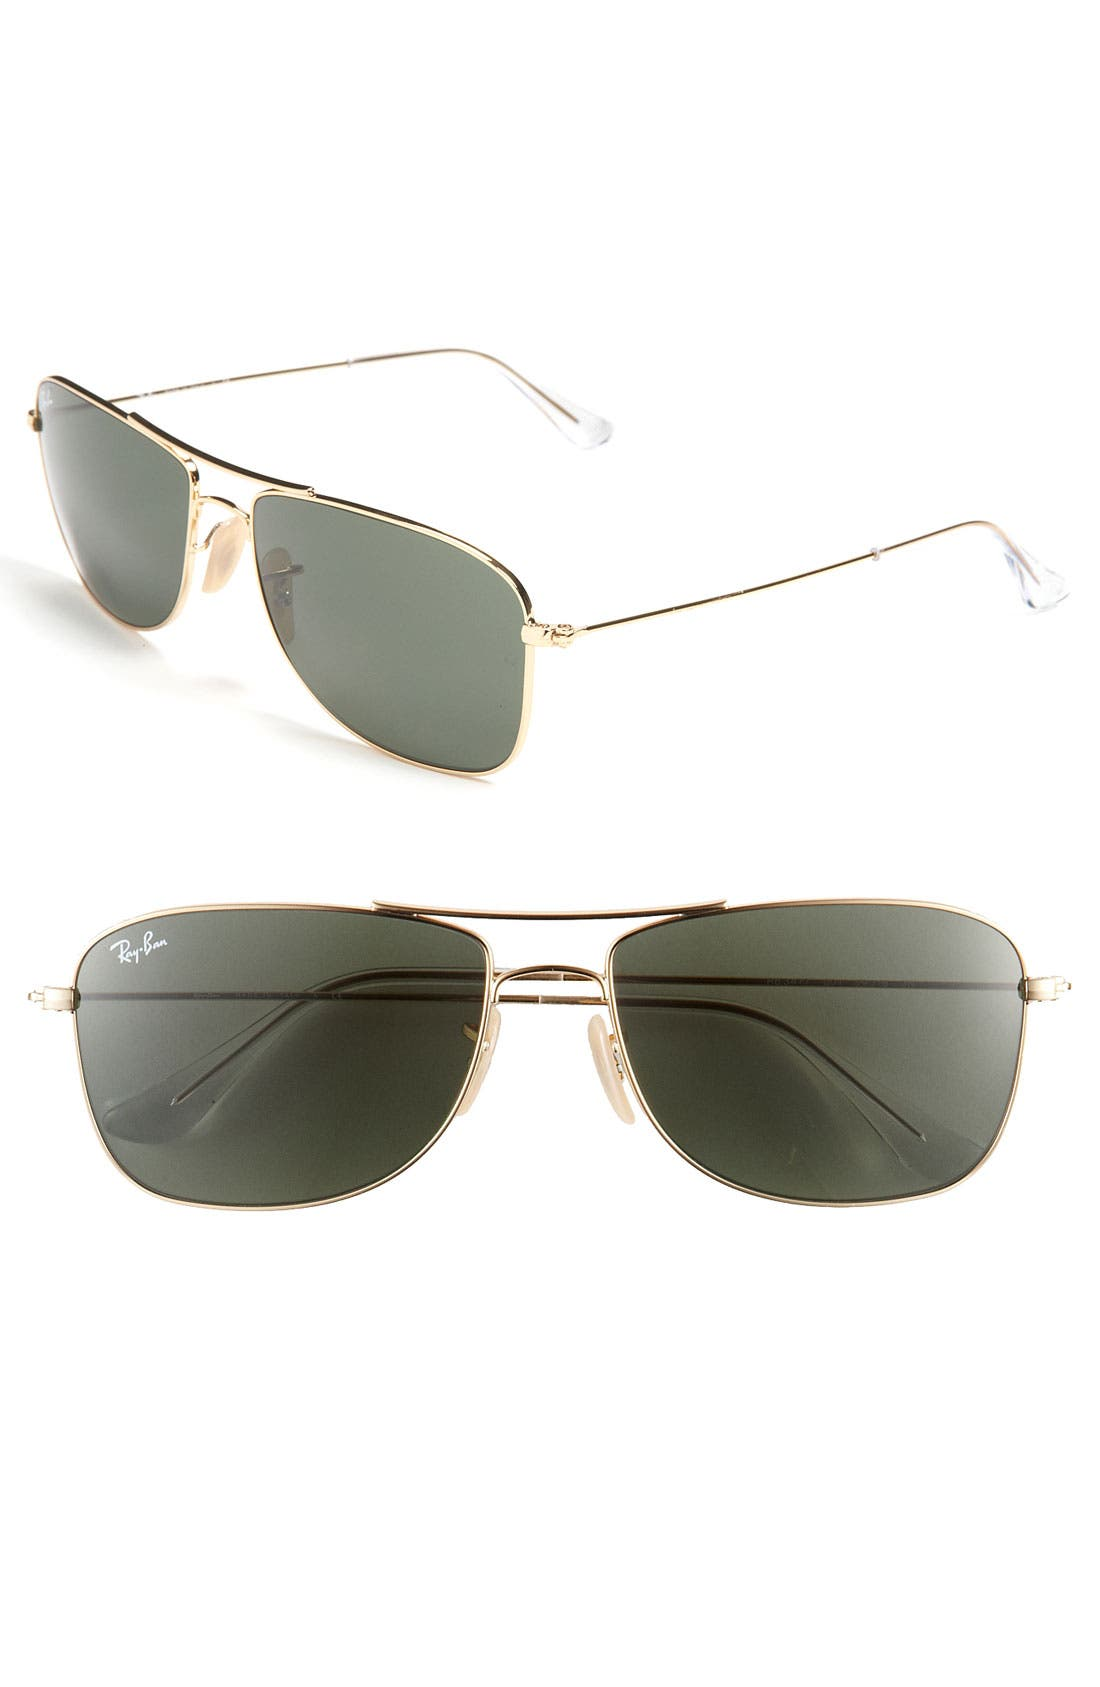 Alternate Image 1 Selected - Ray-Ban 59mm Navigator Sunglasses